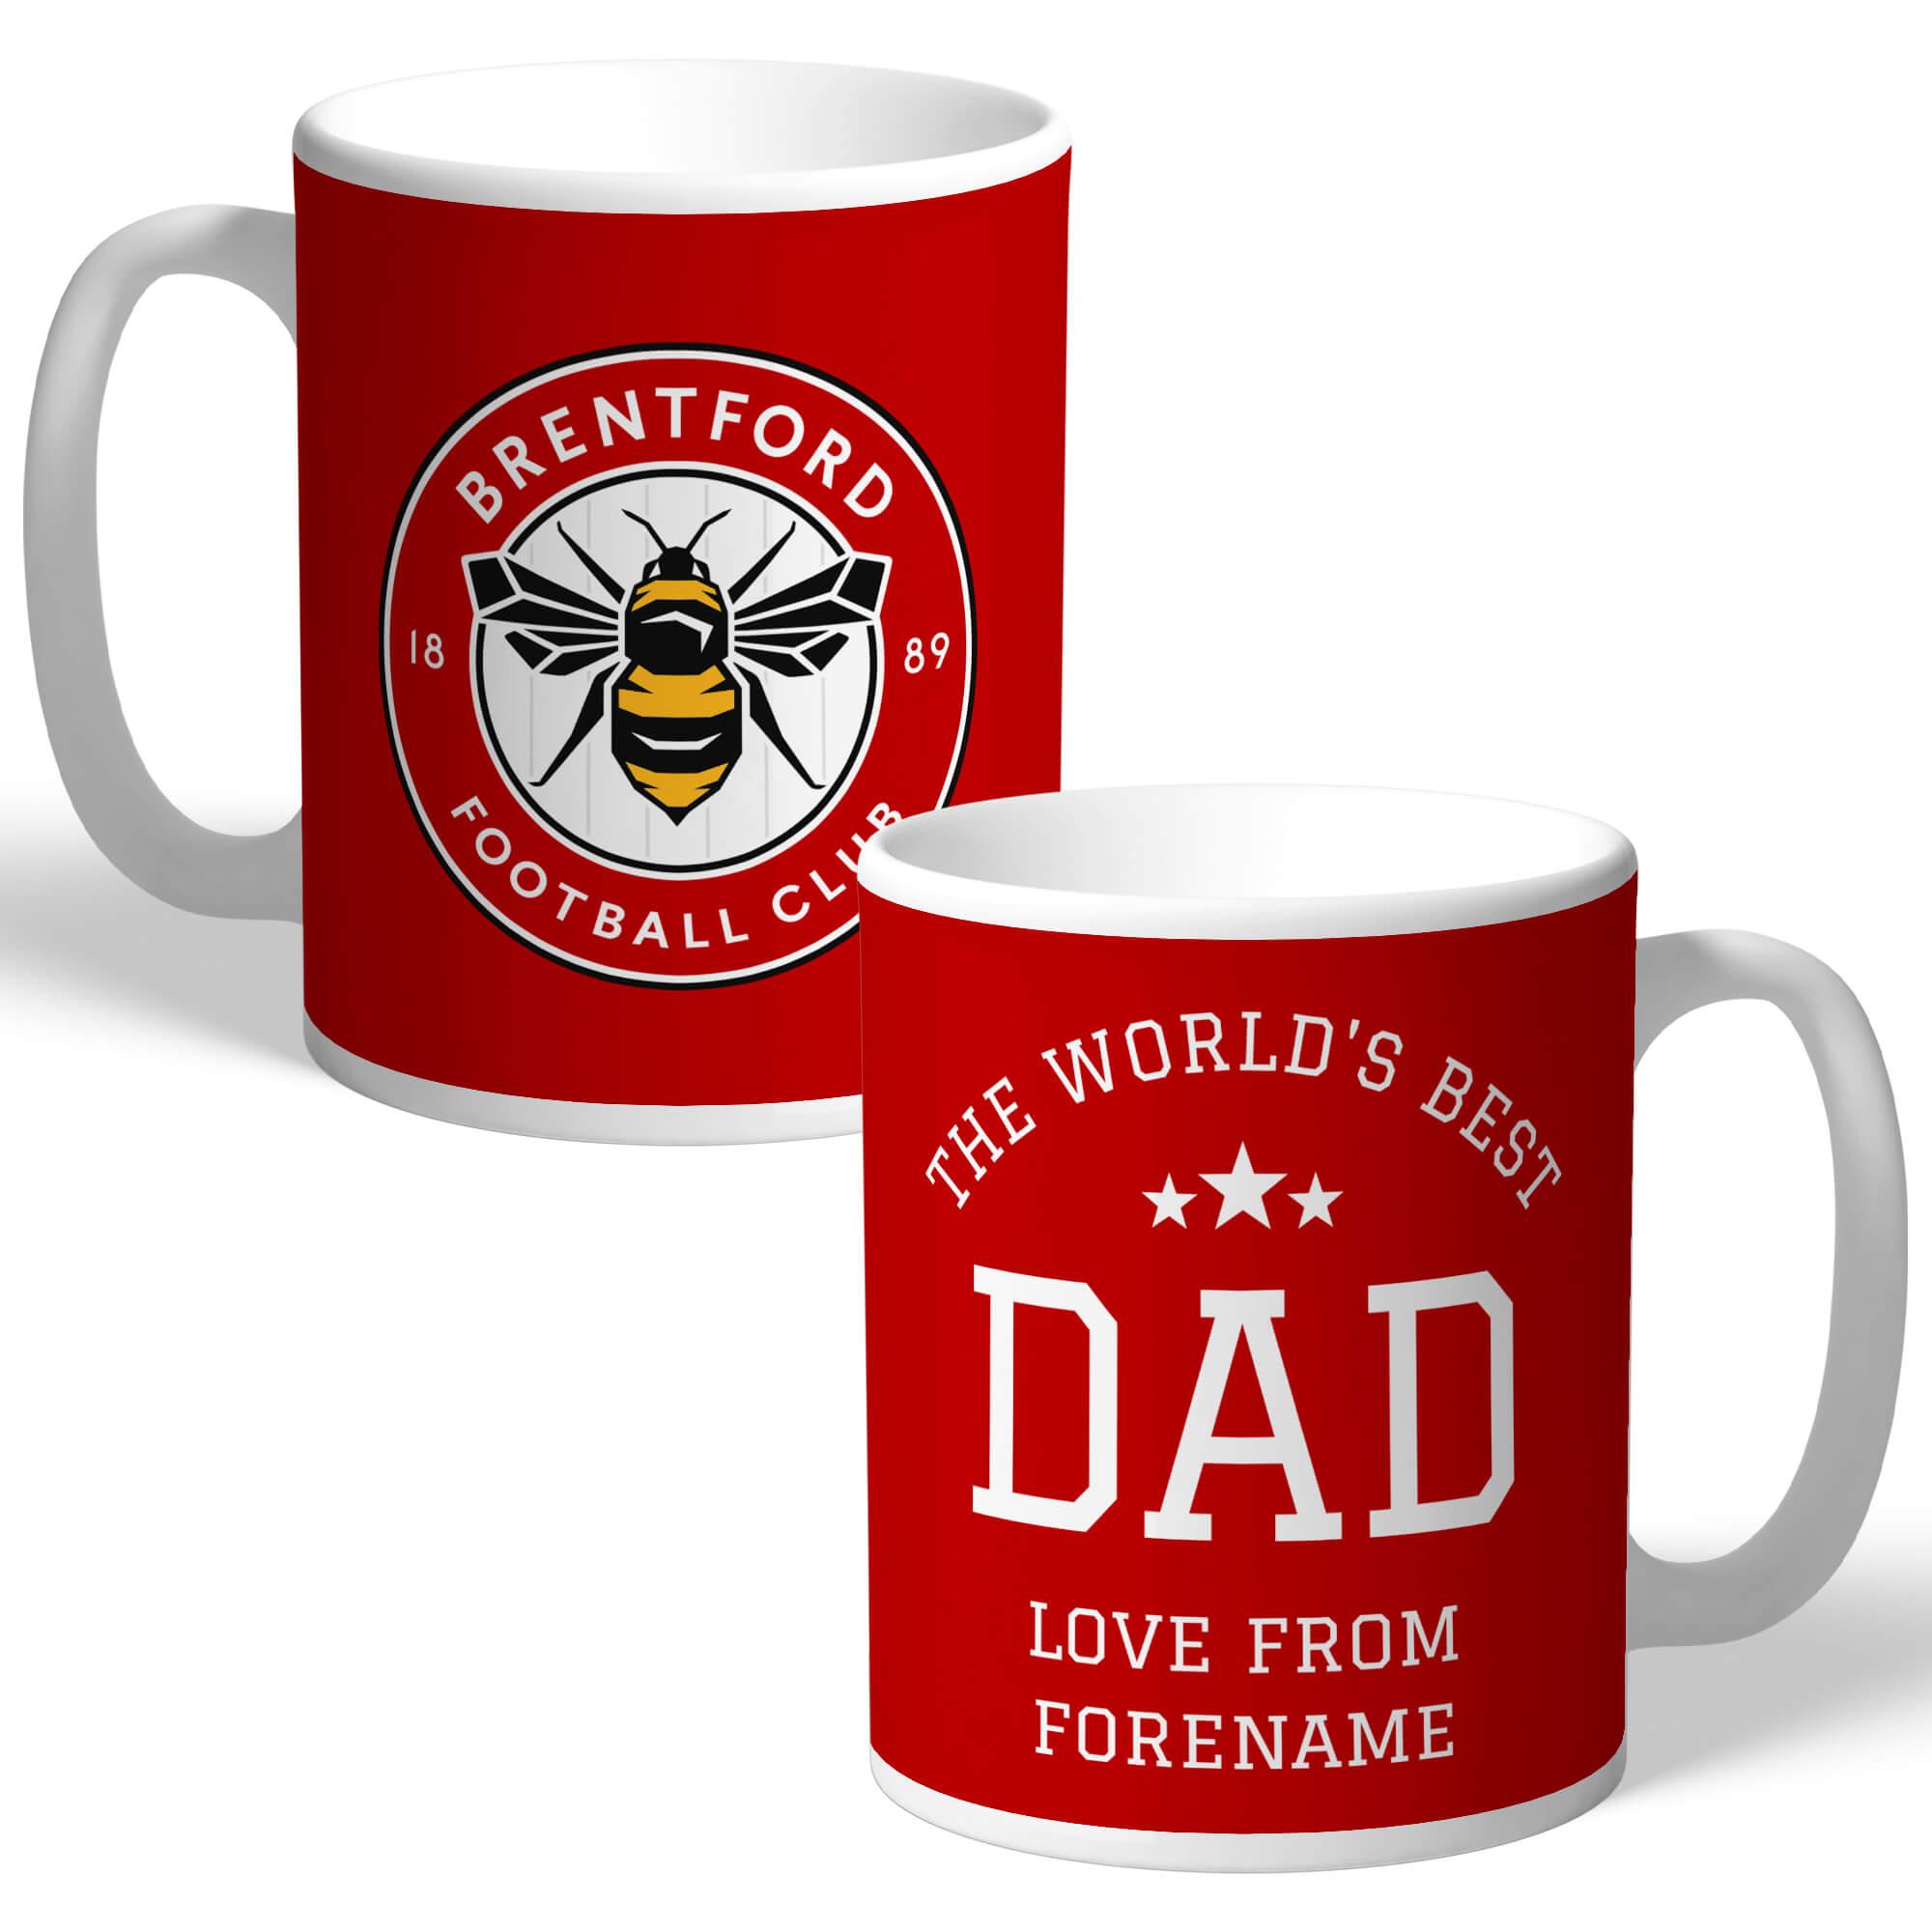 Brentford FC World's Best Dad Mug